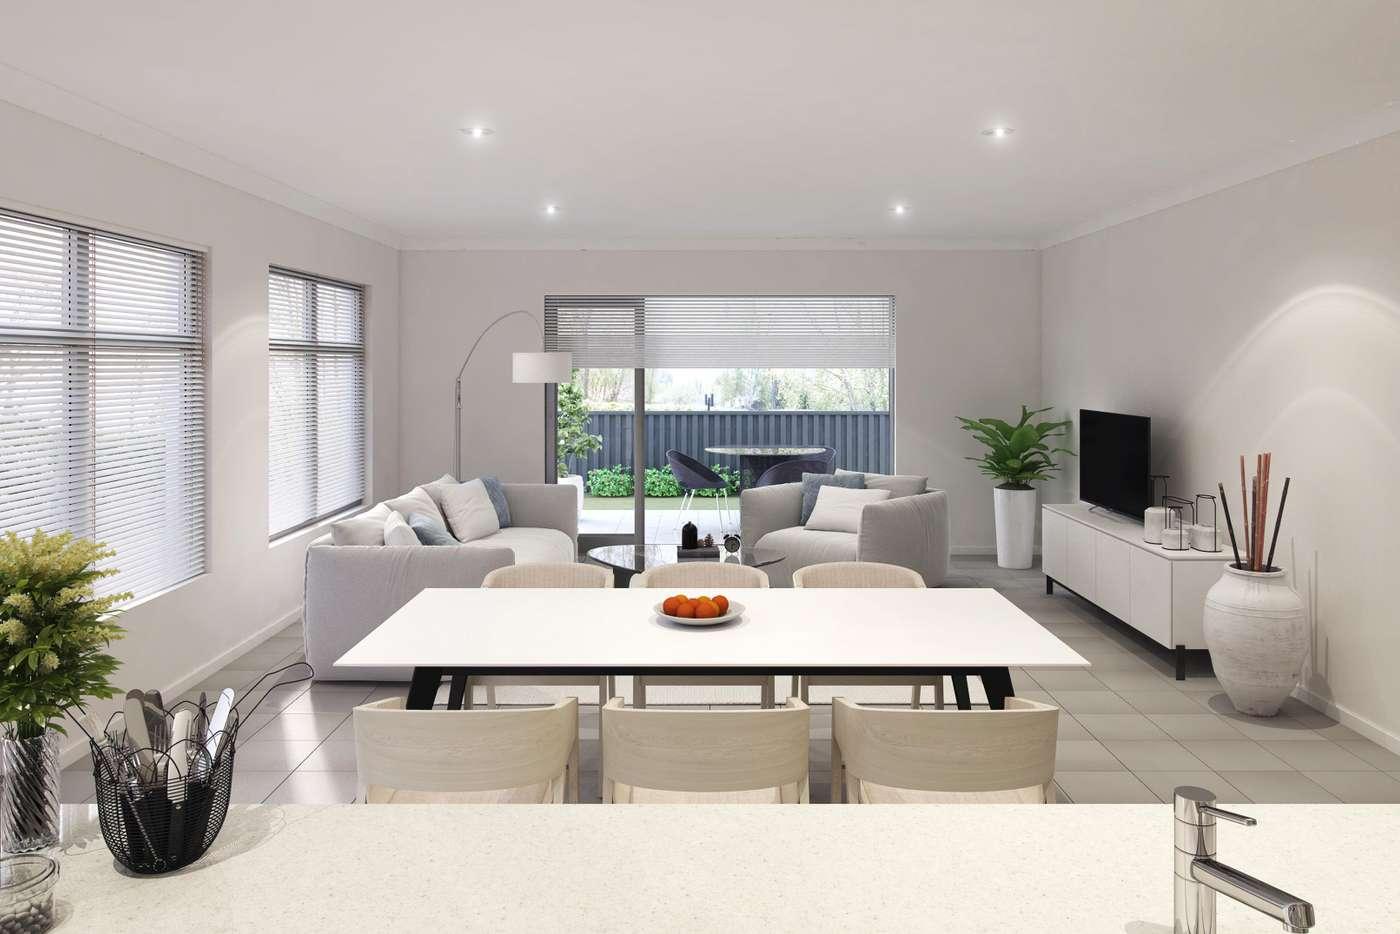 Sixth view of Homely house listing, 2088 Albany Highway, Maddington WA 6109